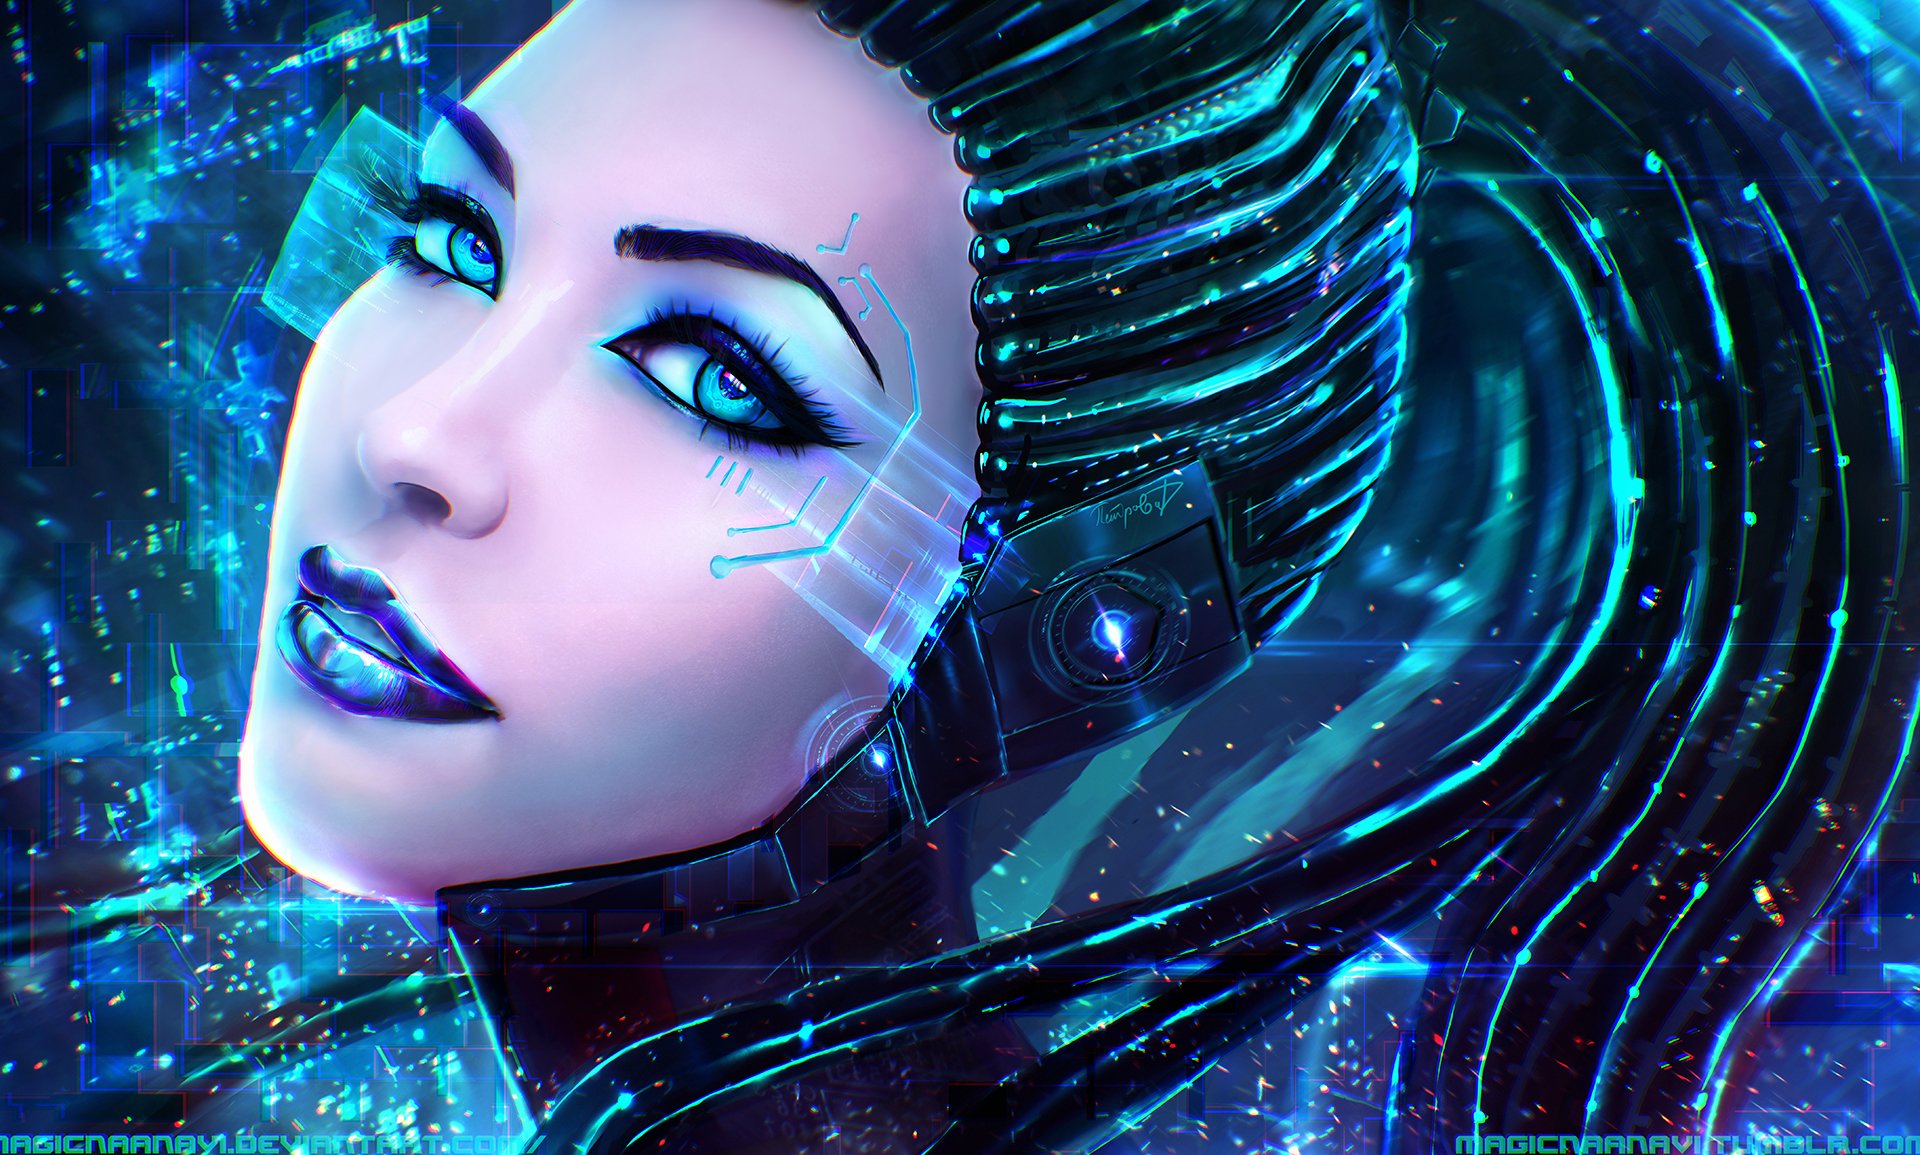 Cyber art érotique